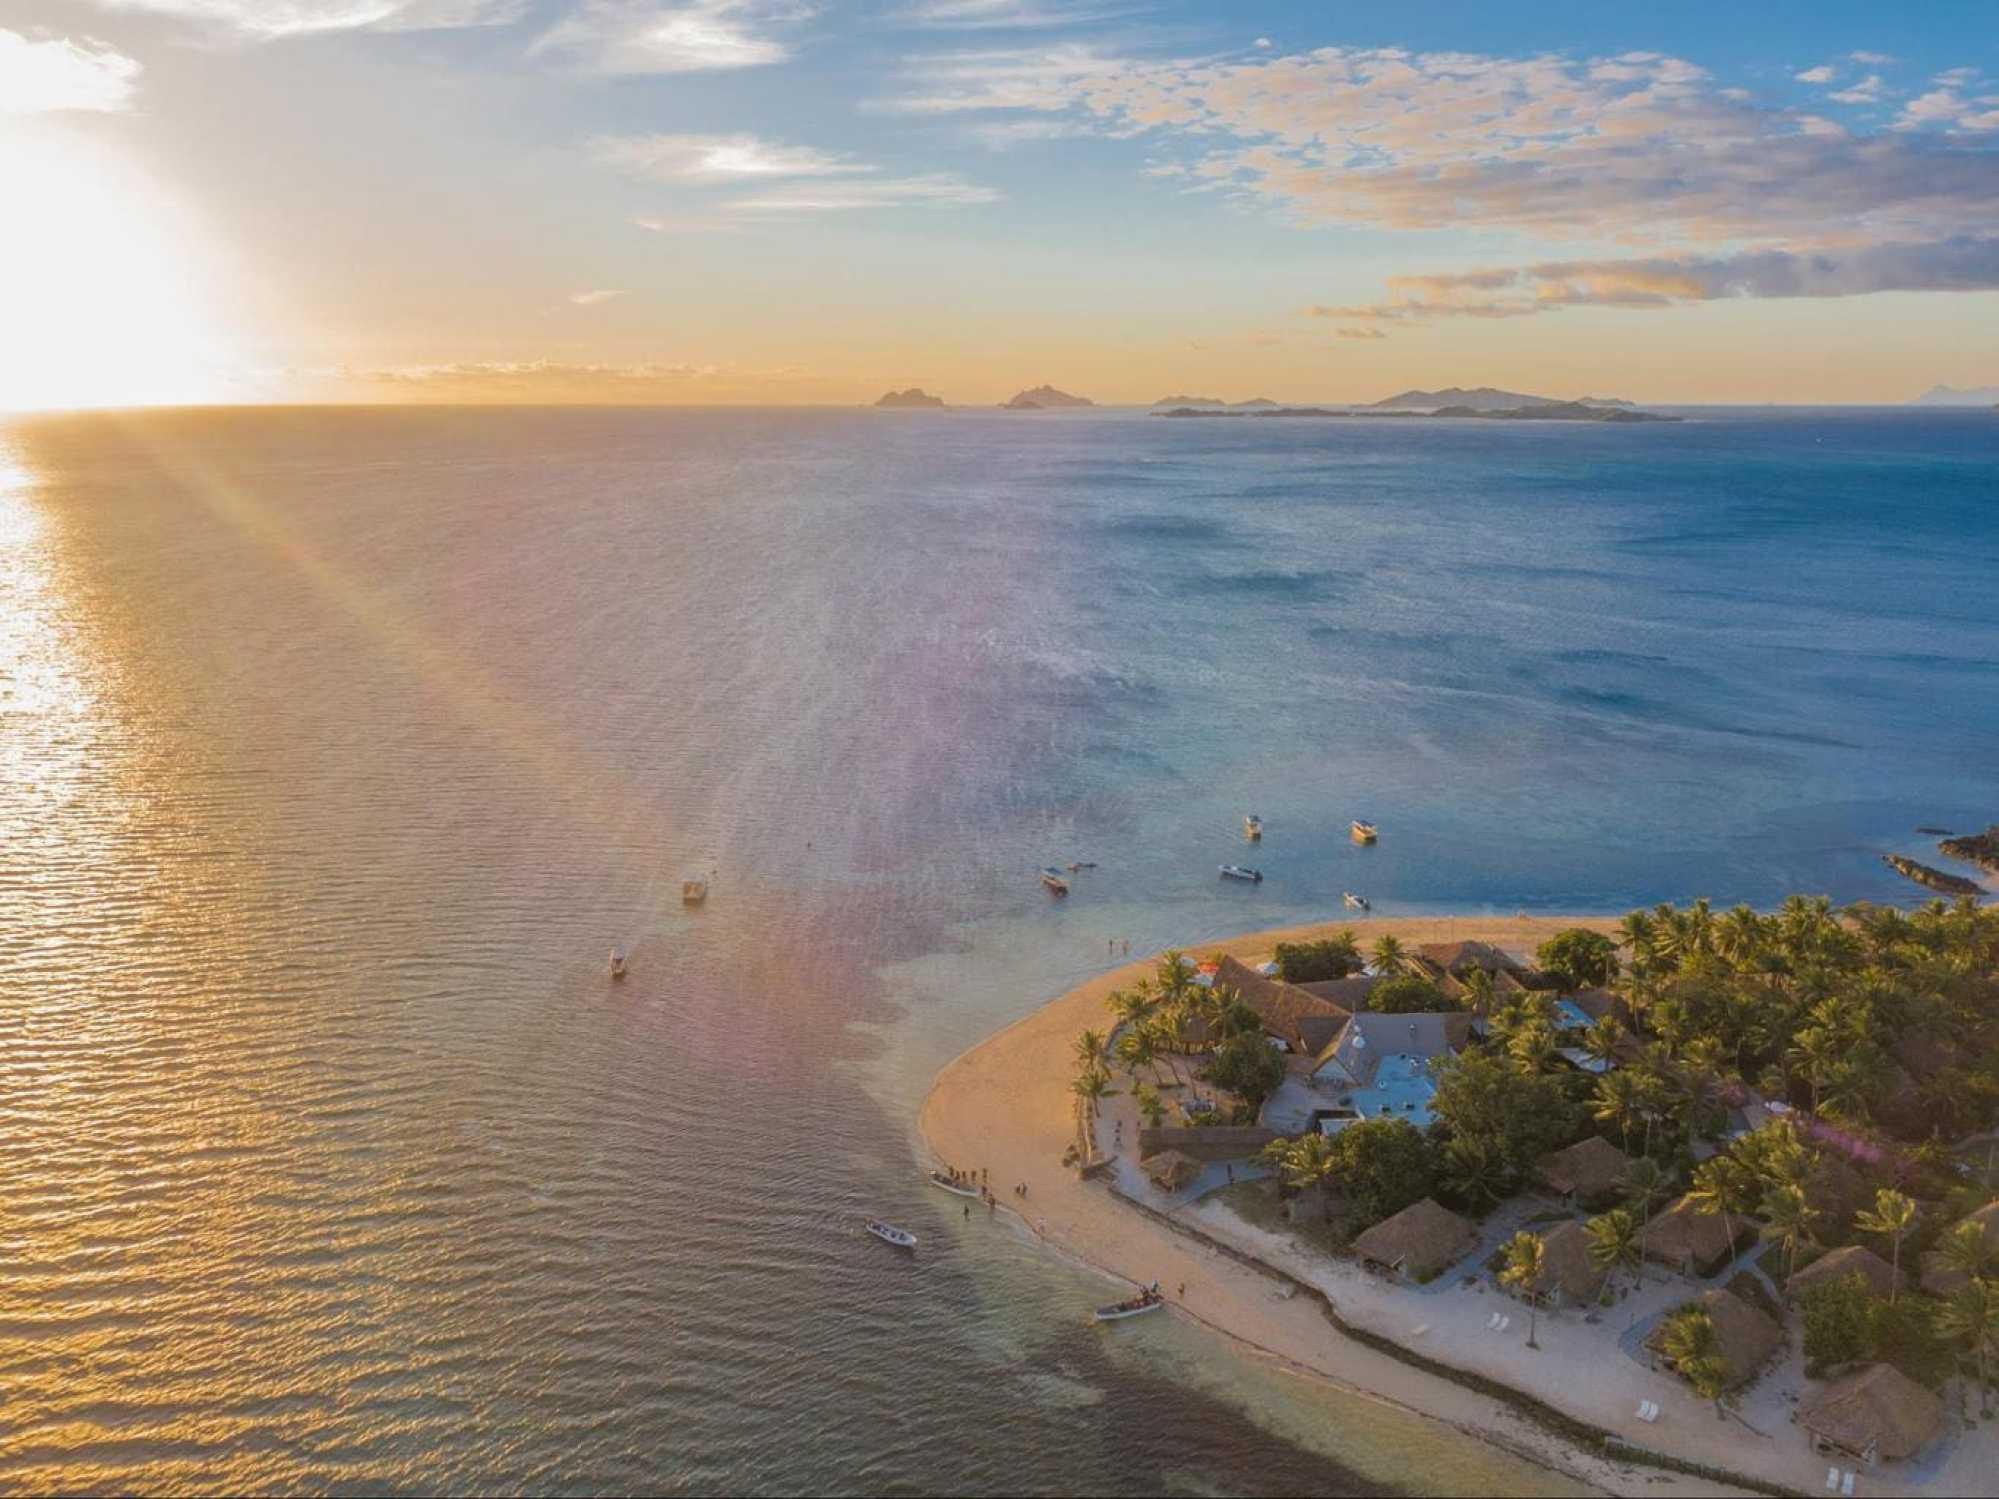 Castaway Island at sunset